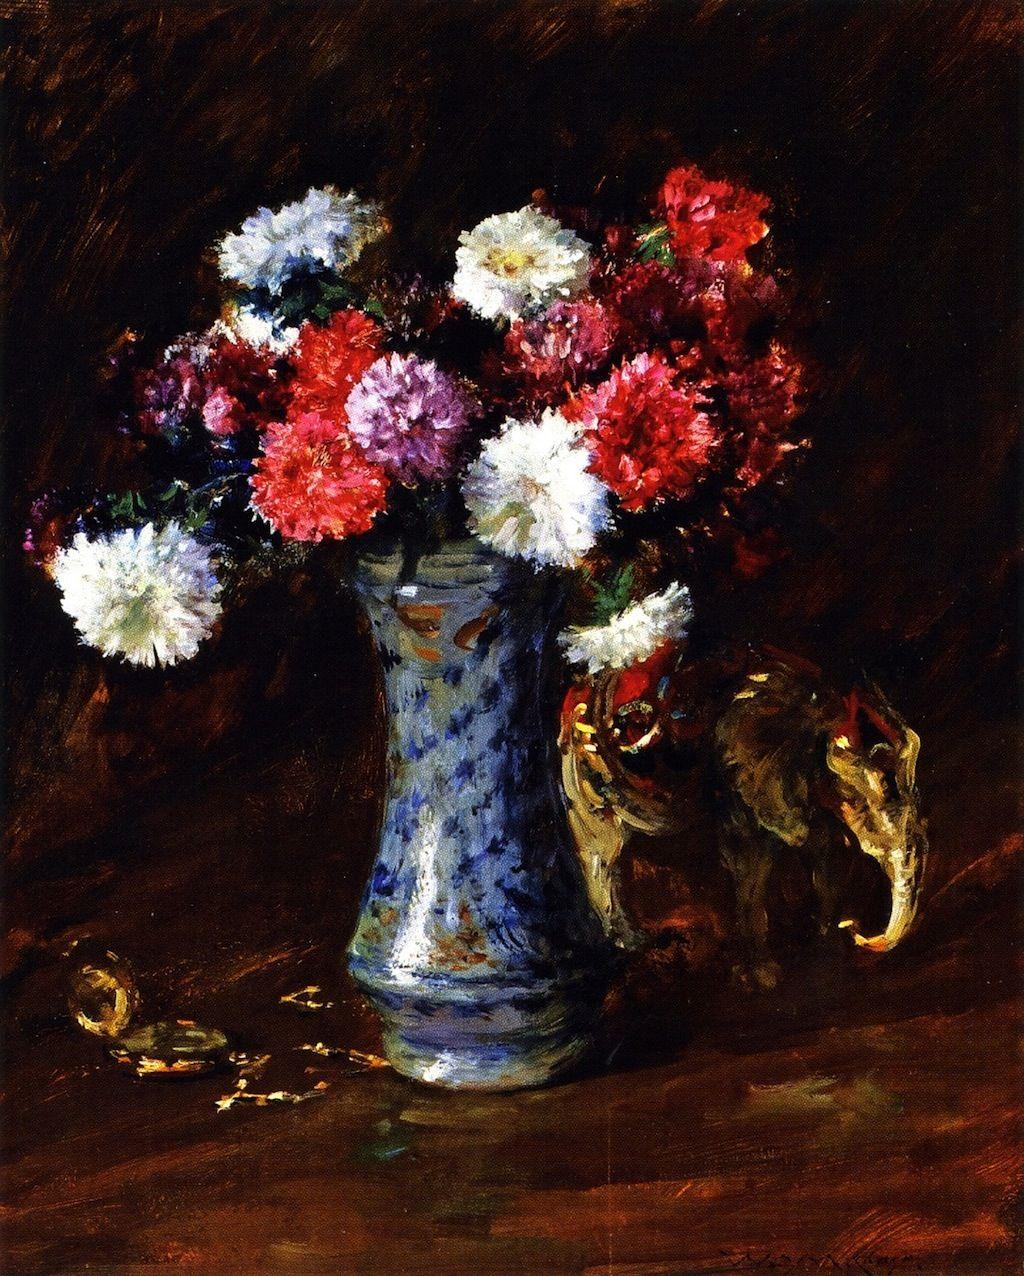 Asters William Merritt Chase Oil Painting Reproduction Flower Art Flower Painting American Art